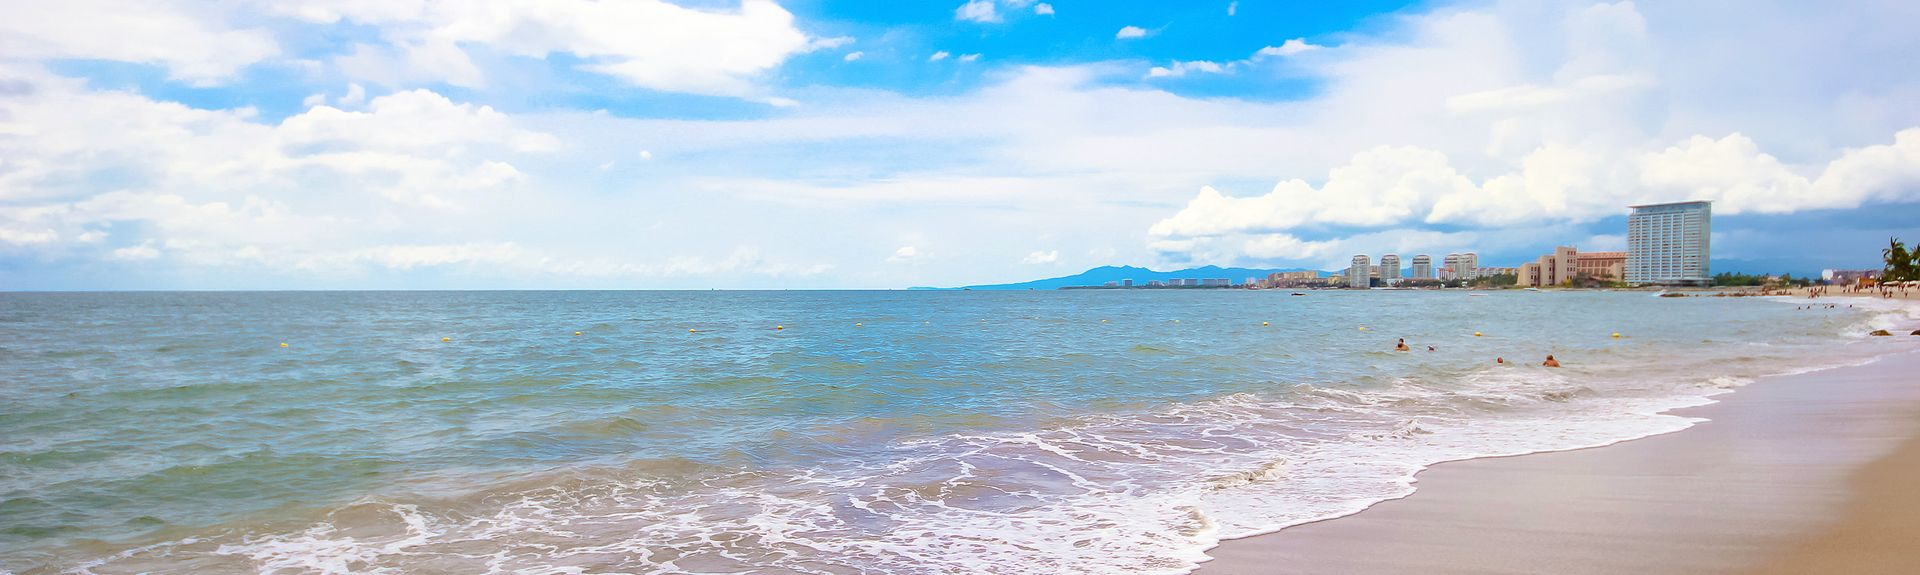 Peninsula Vallarta (Puerto Vallarta, Jalisco, Mexique)